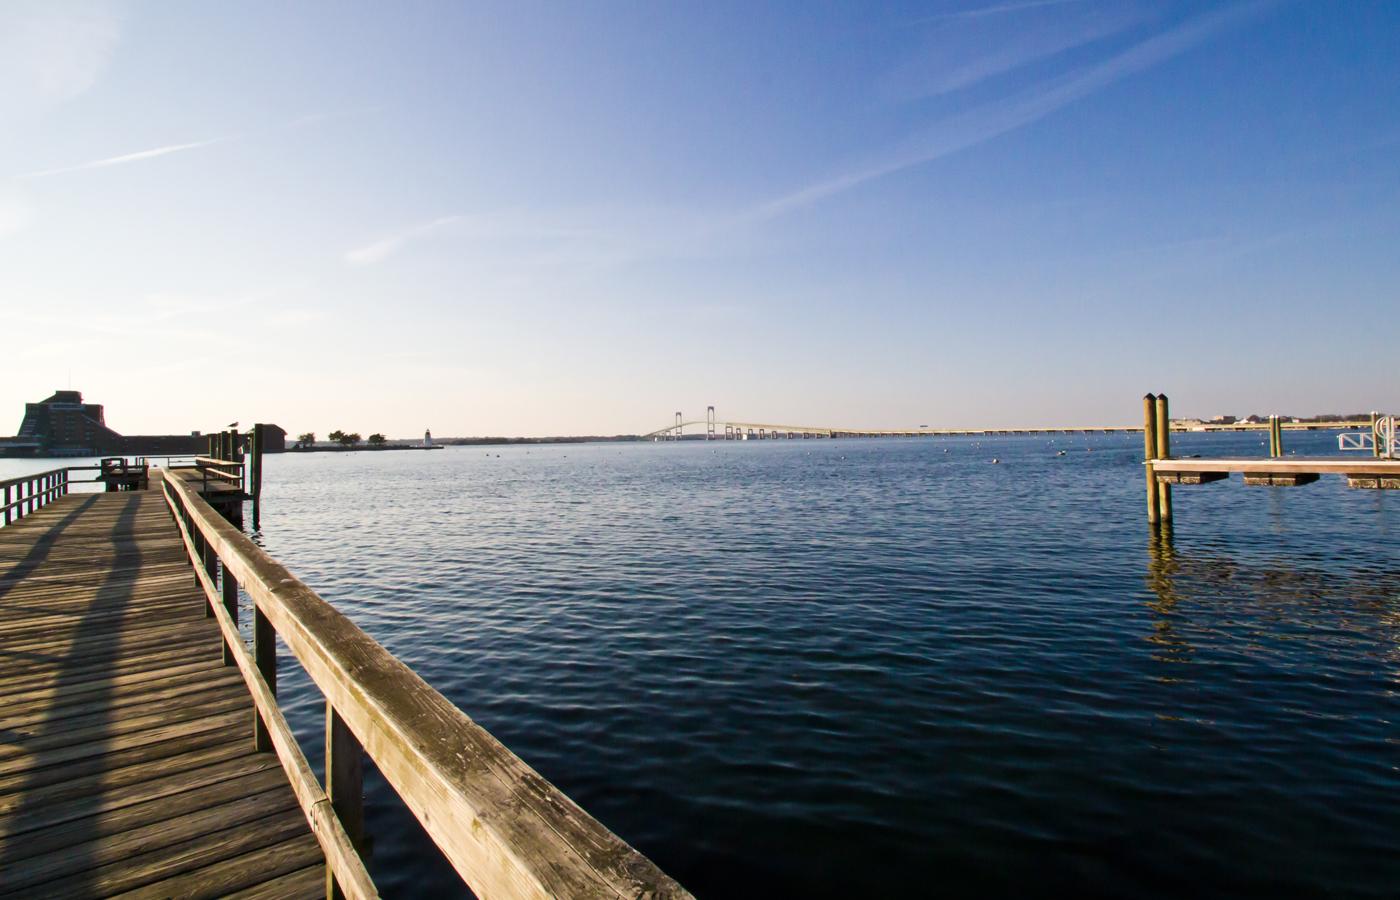 sarah_kendall_bg_newport_dock1.jpg